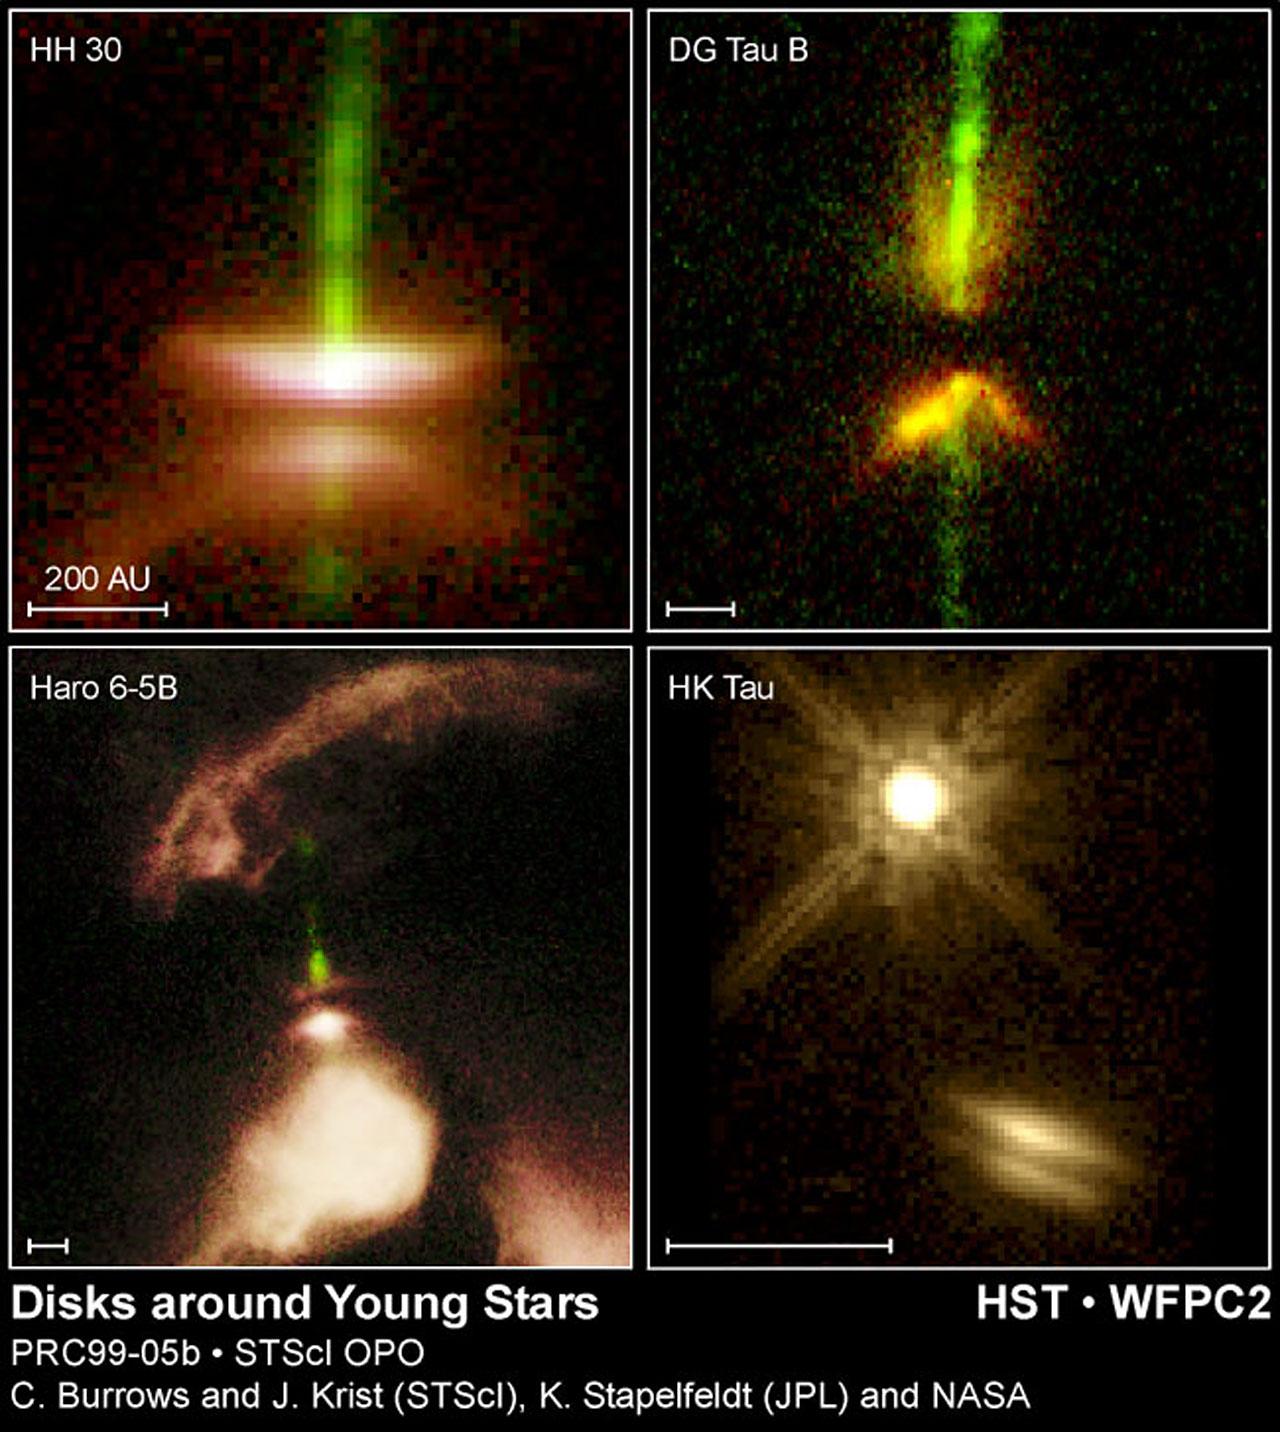 Disks Around Young Stars